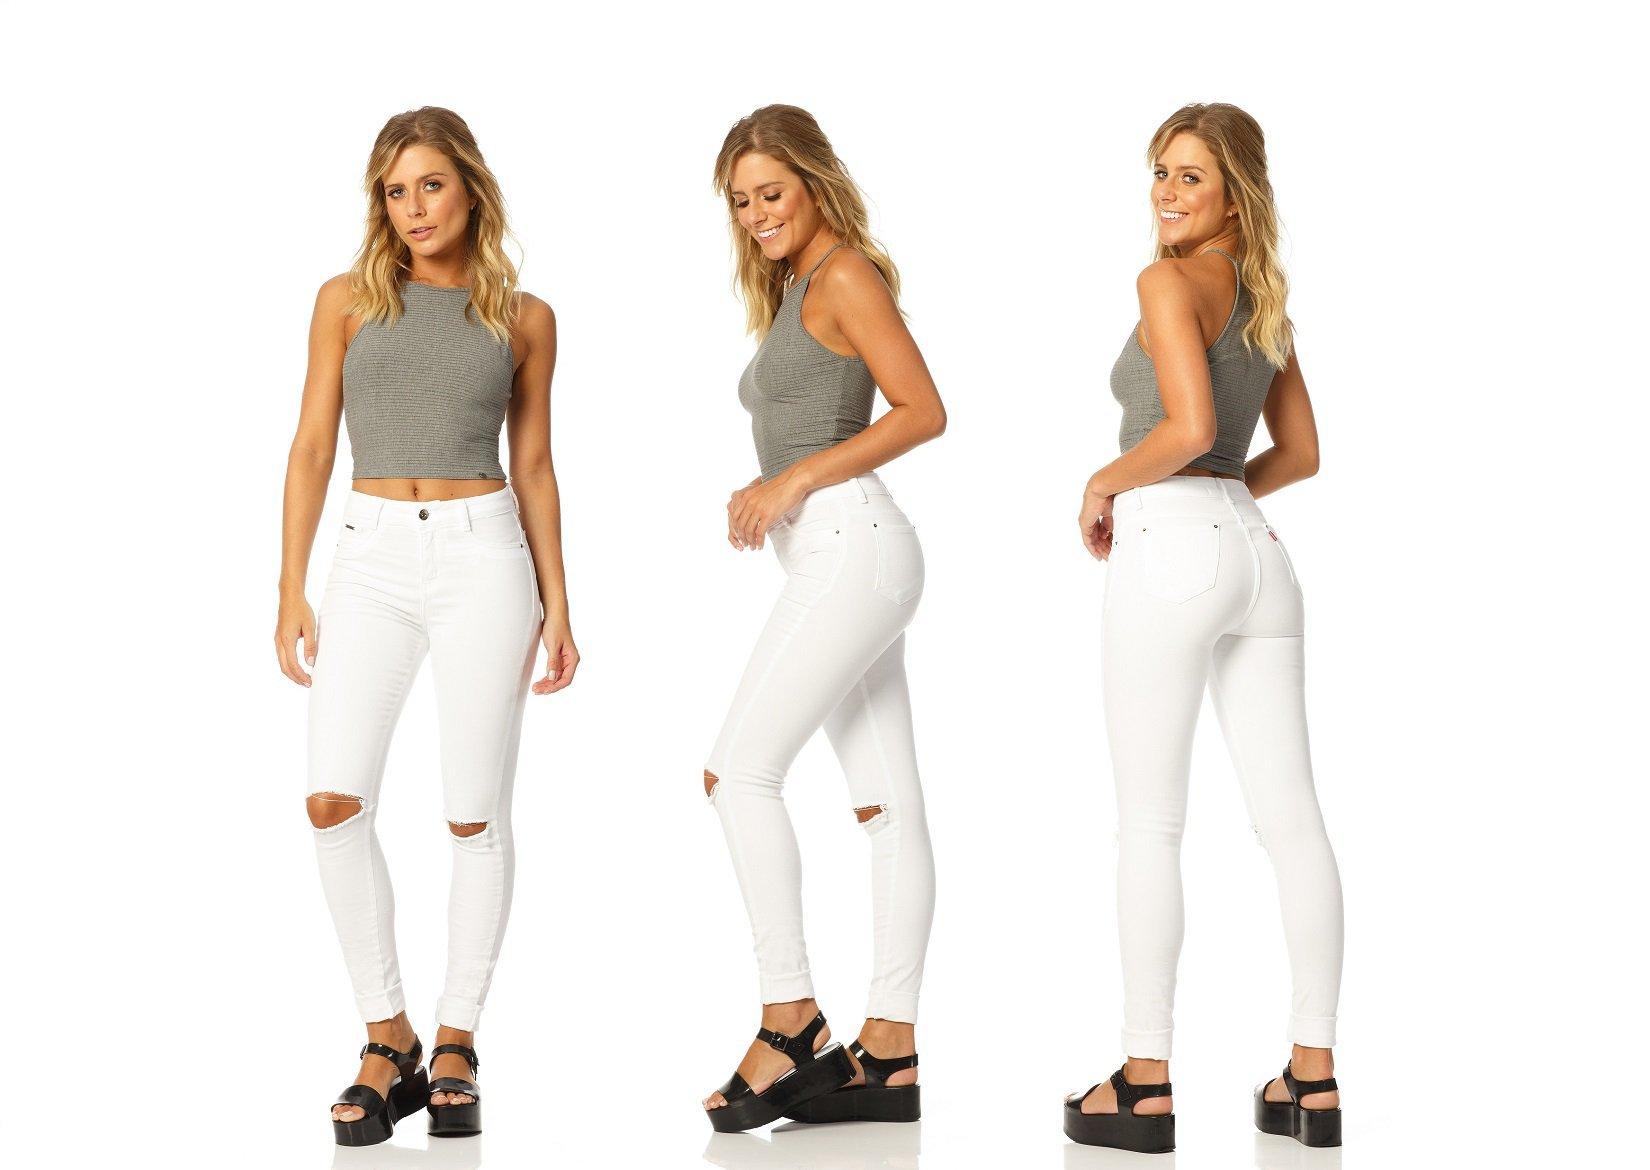 calca skinny media branco dz2374 frente denim zero descricao